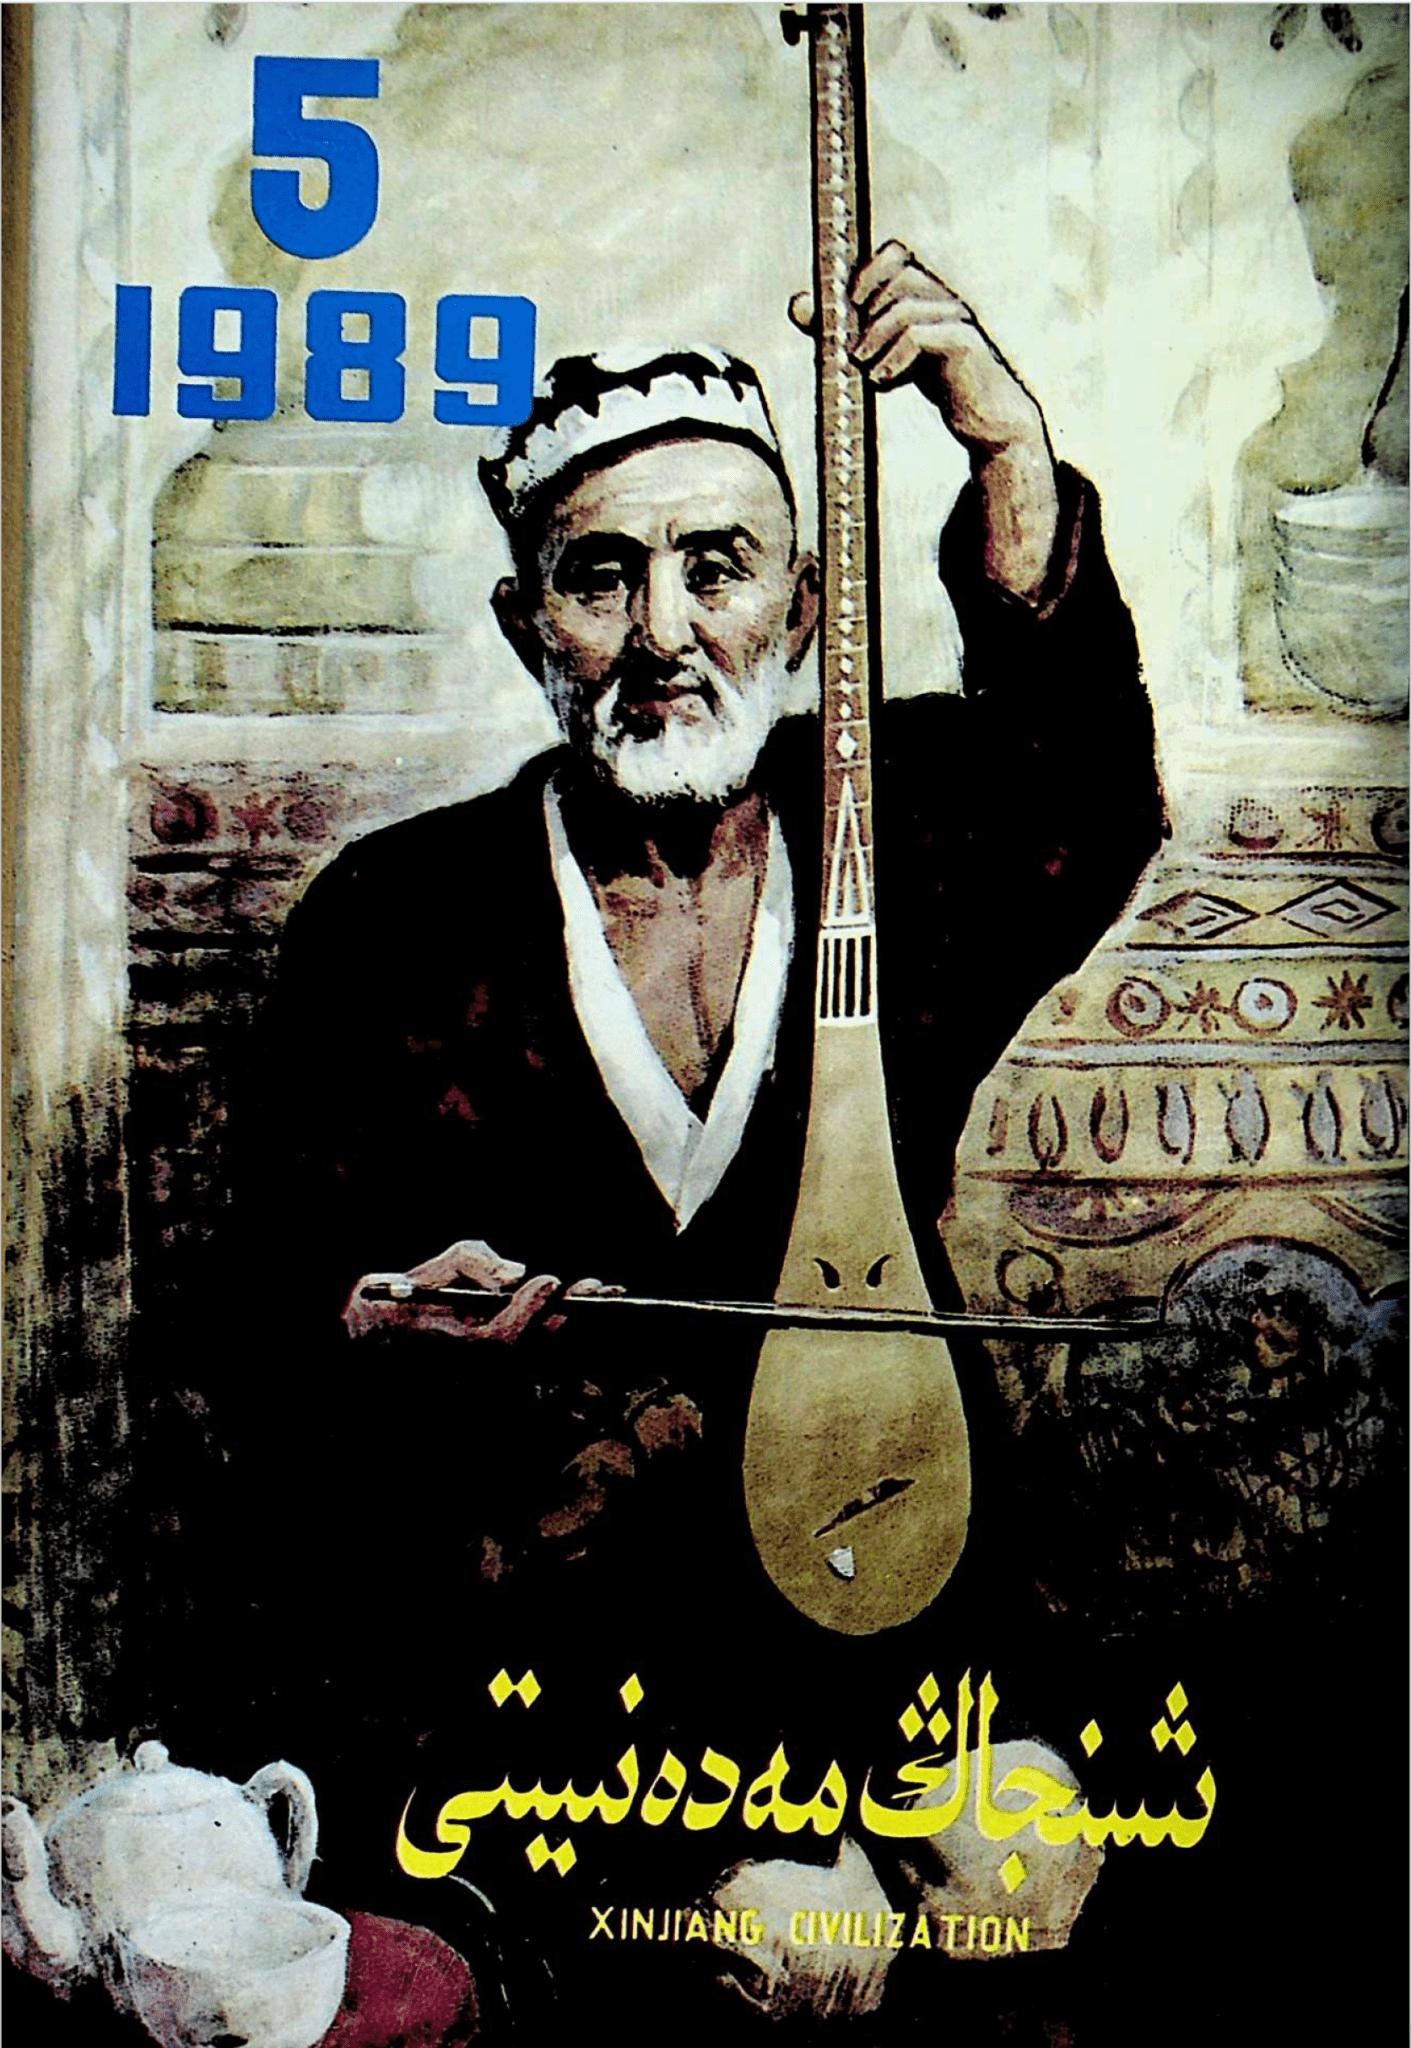 Screenshot 2020 03 05 at 15.30.28 - شىنجاڭ مەدەنىيىتى 1989-يىلى 5-سان